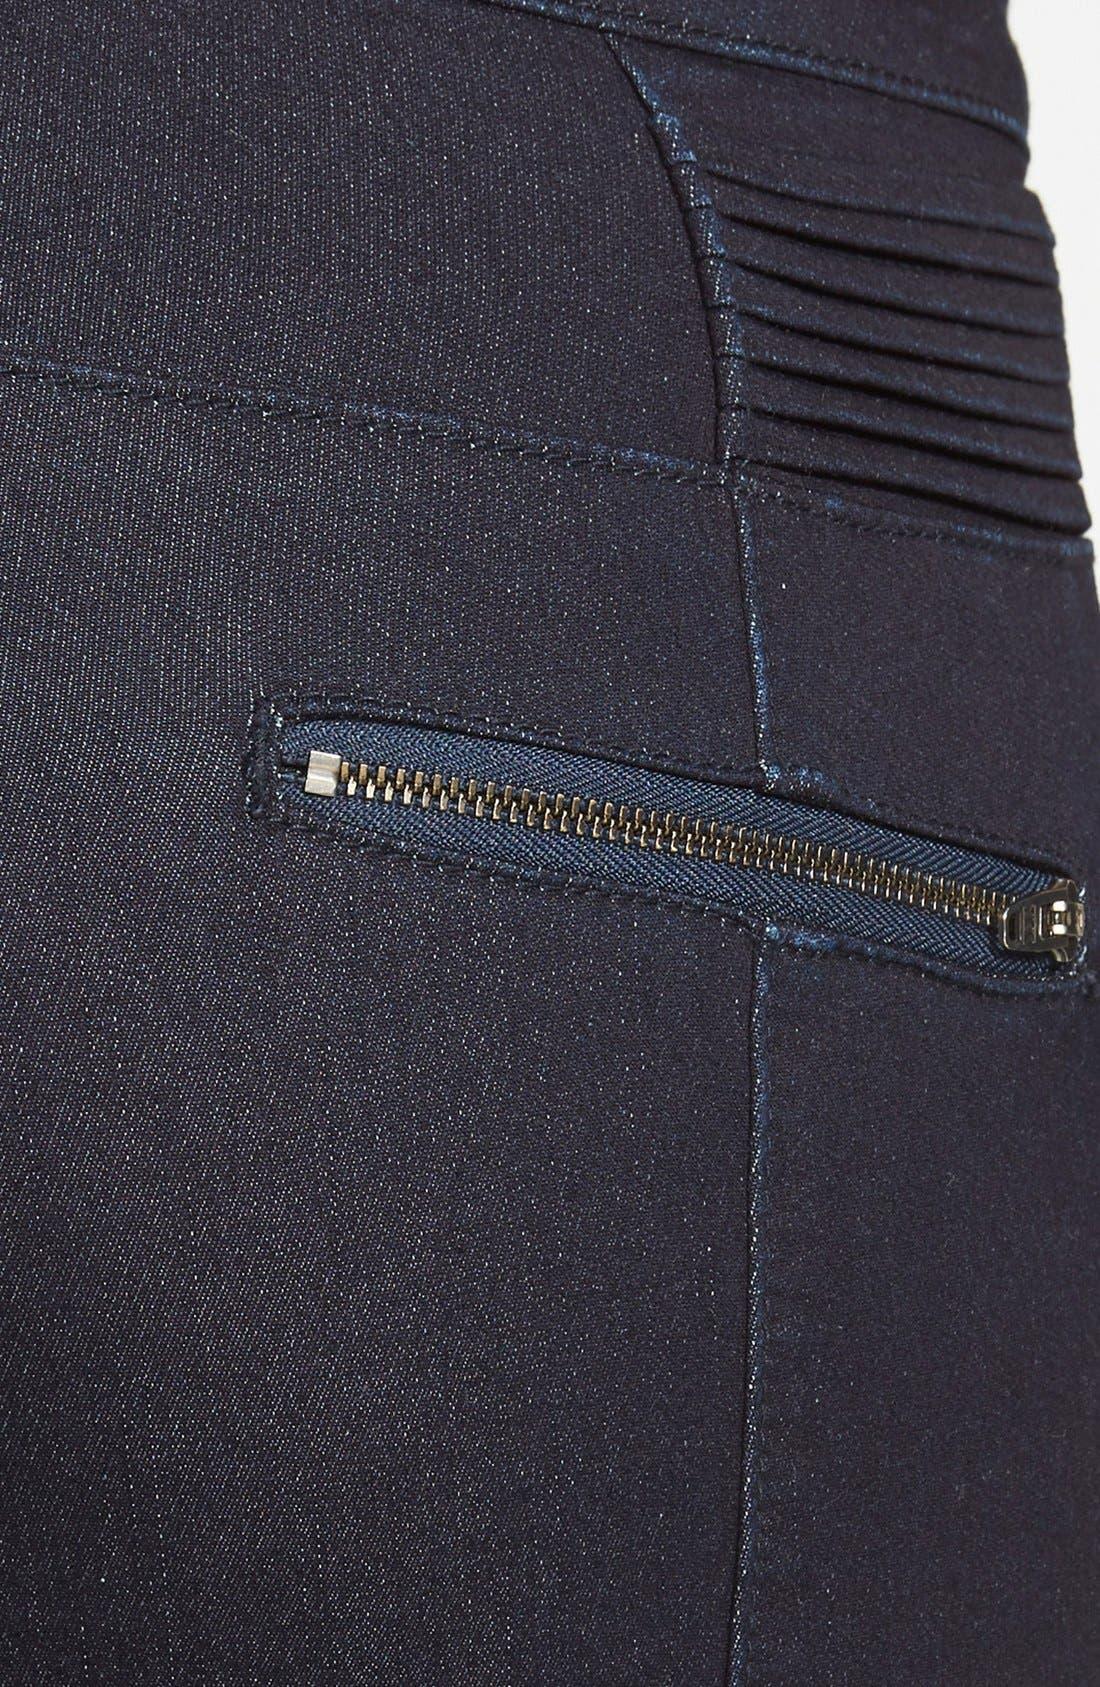 Alternate Image 3  - Standards & Practices 'Sachi' Moto Skinny Jeans (Blue) (Online Only)